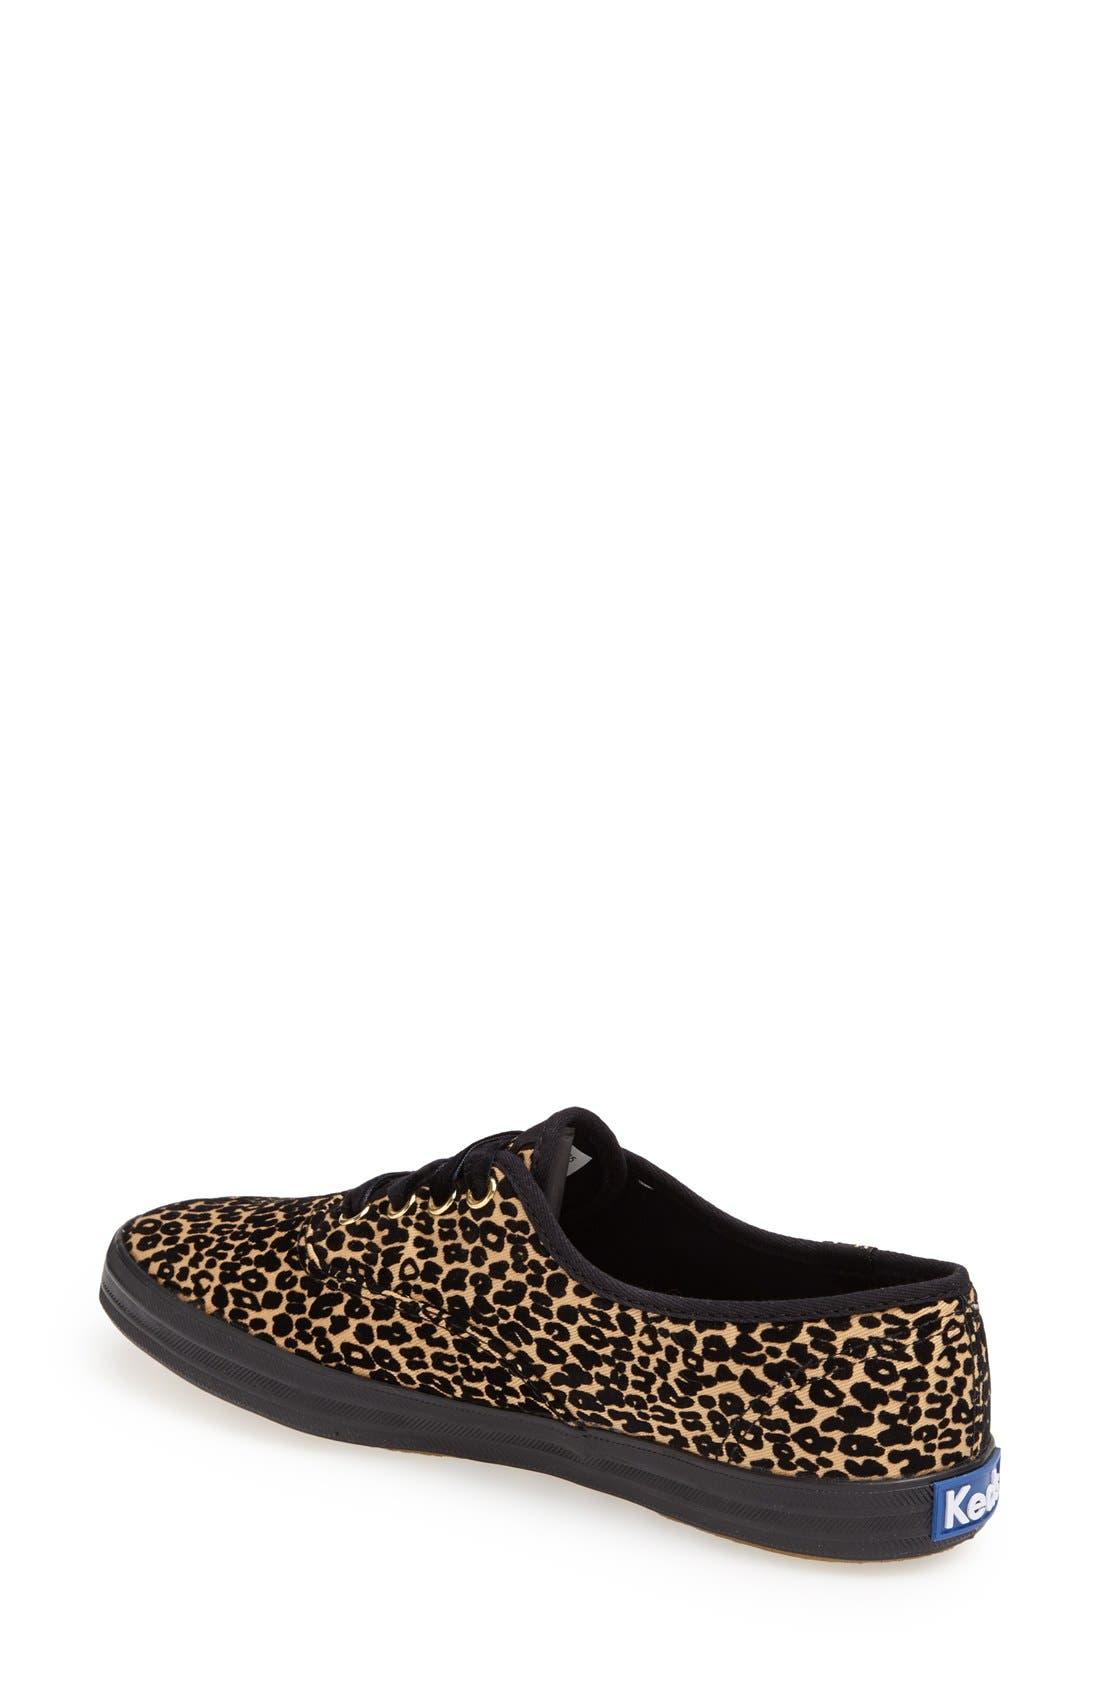 Alternate Image 2  - Keds® 'Champion - Leopard Spot' Sneaker (Women)